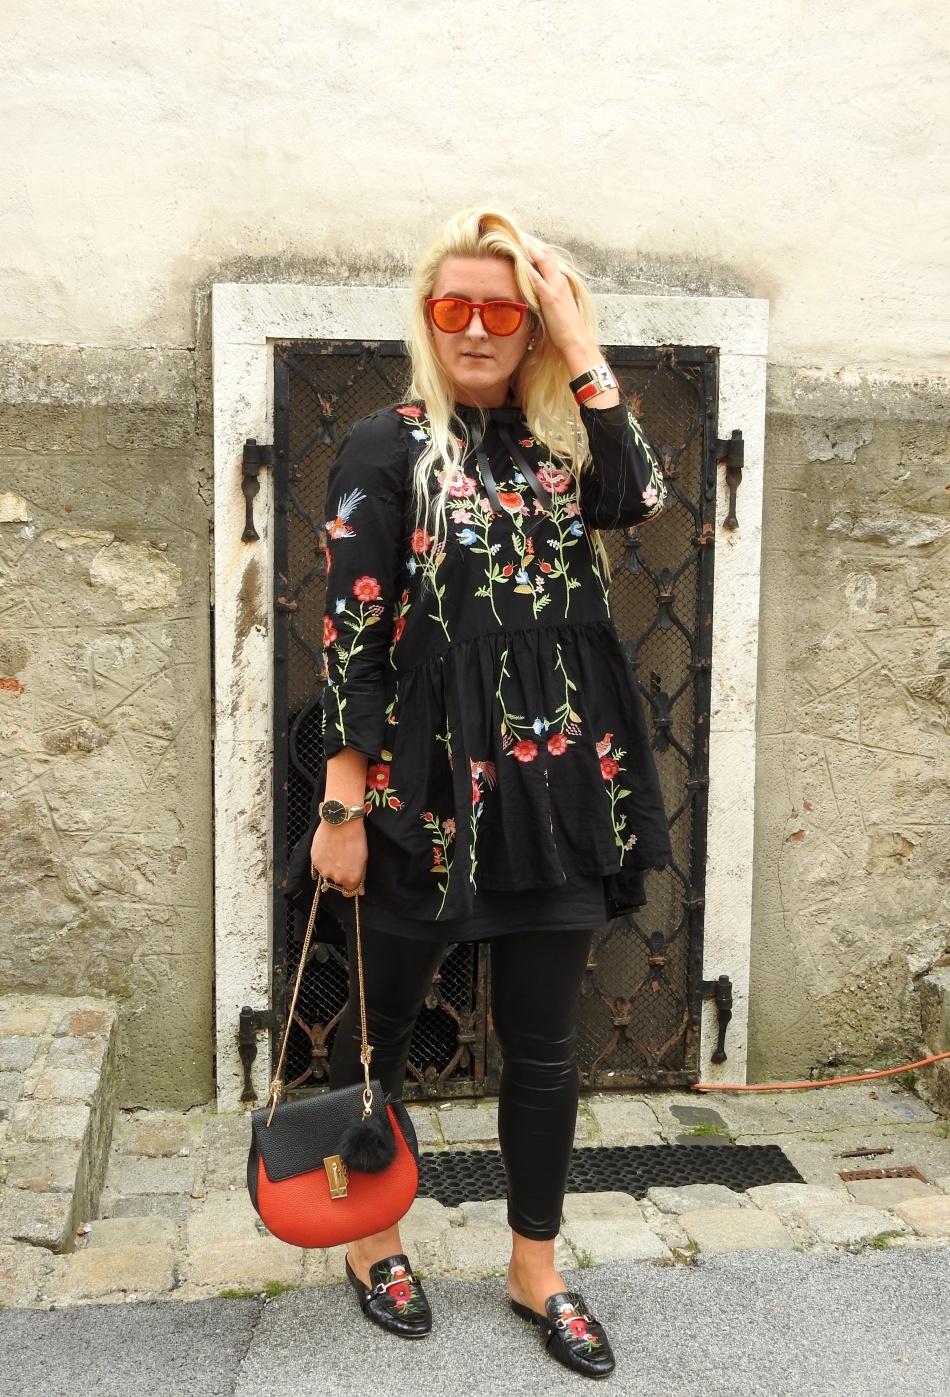 Allinblack-carrieslifestyle-Mules-Gucci-Leatherpants-Dress-Chloe-Drew-Bag-Embroidered-Tamara-Prutsch